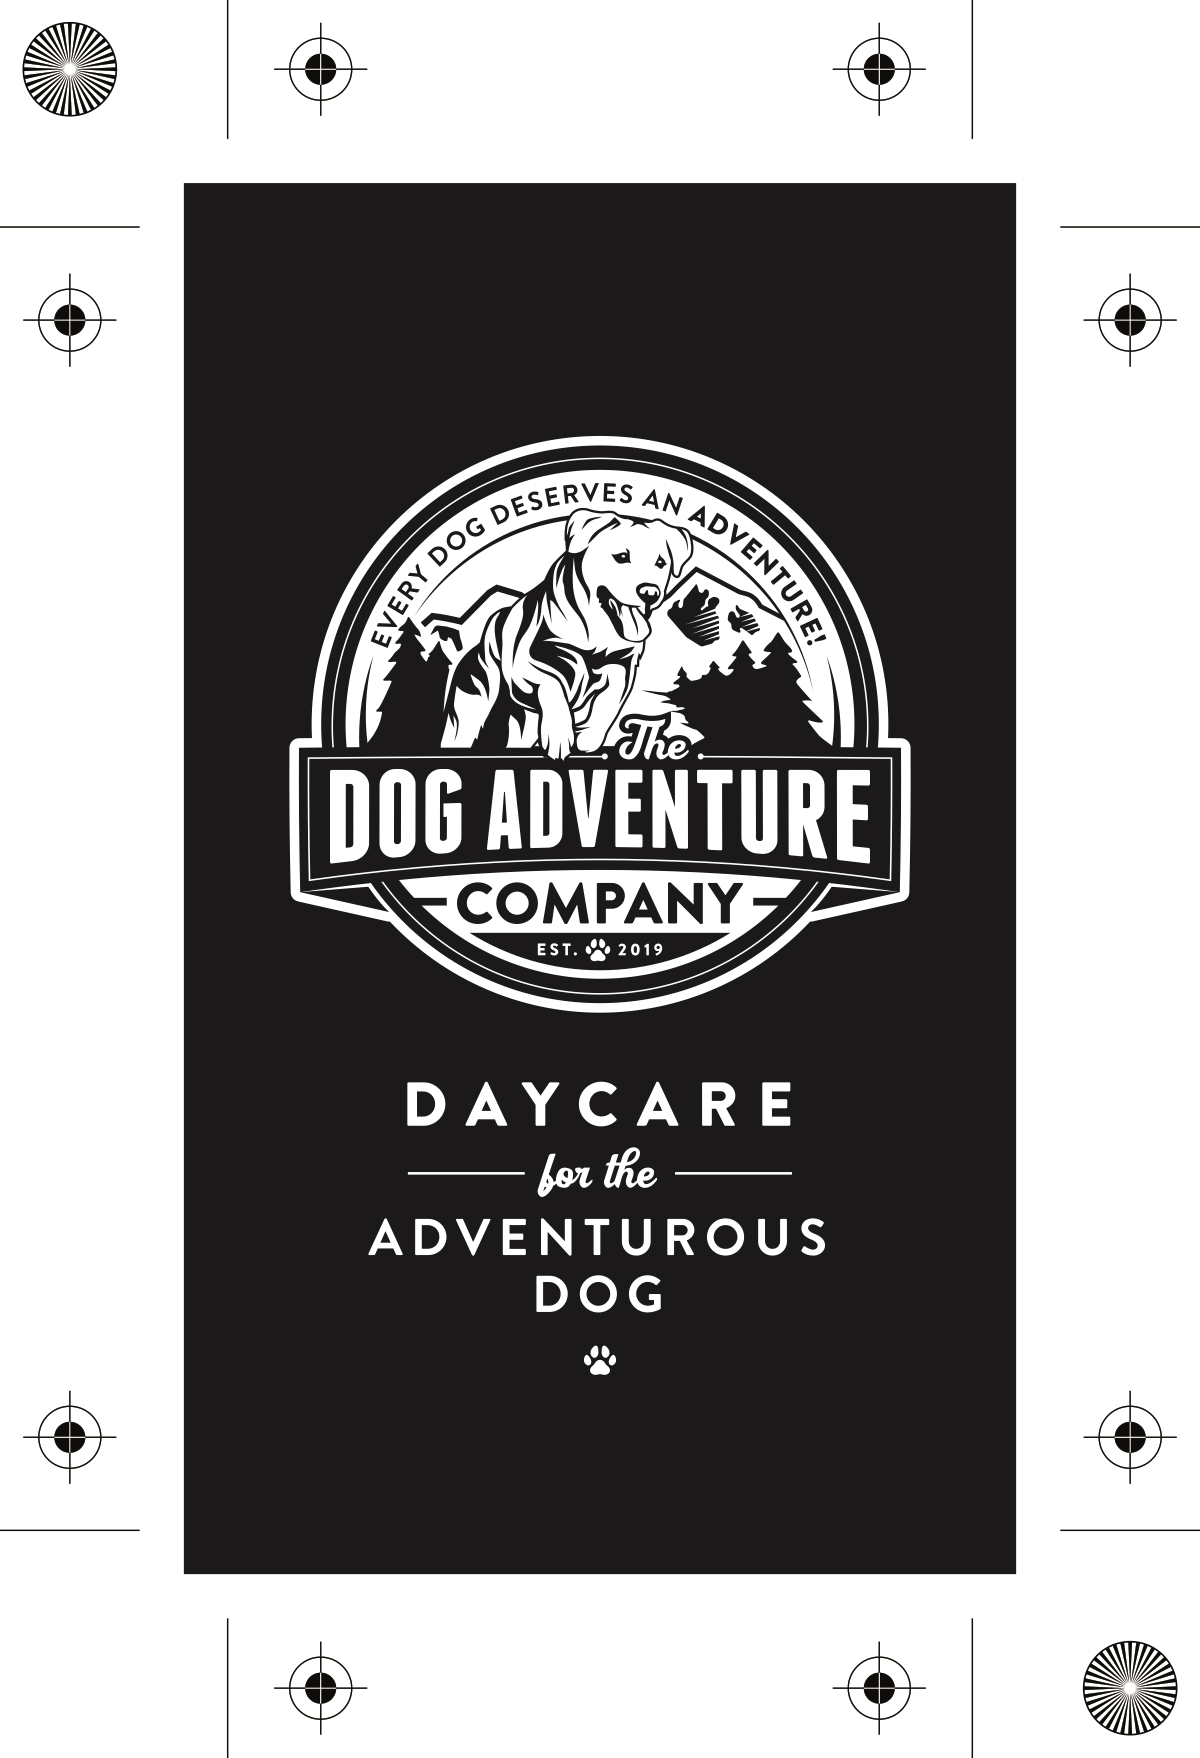 The Dog Adventure Company business card design